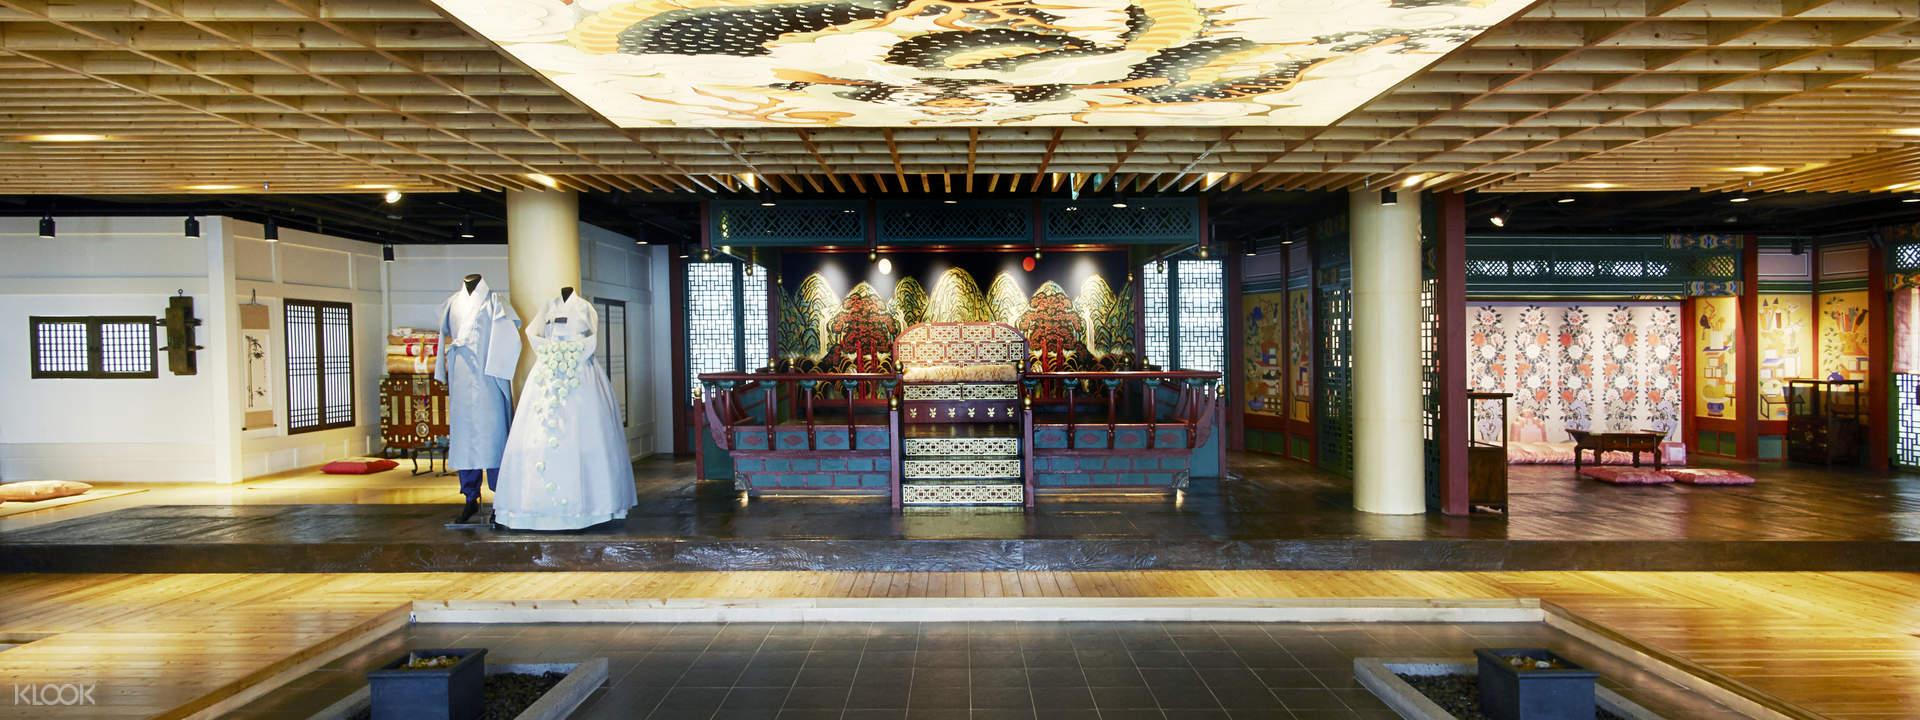 N Seoul Tower Cultural Hanbok Experience - Klook